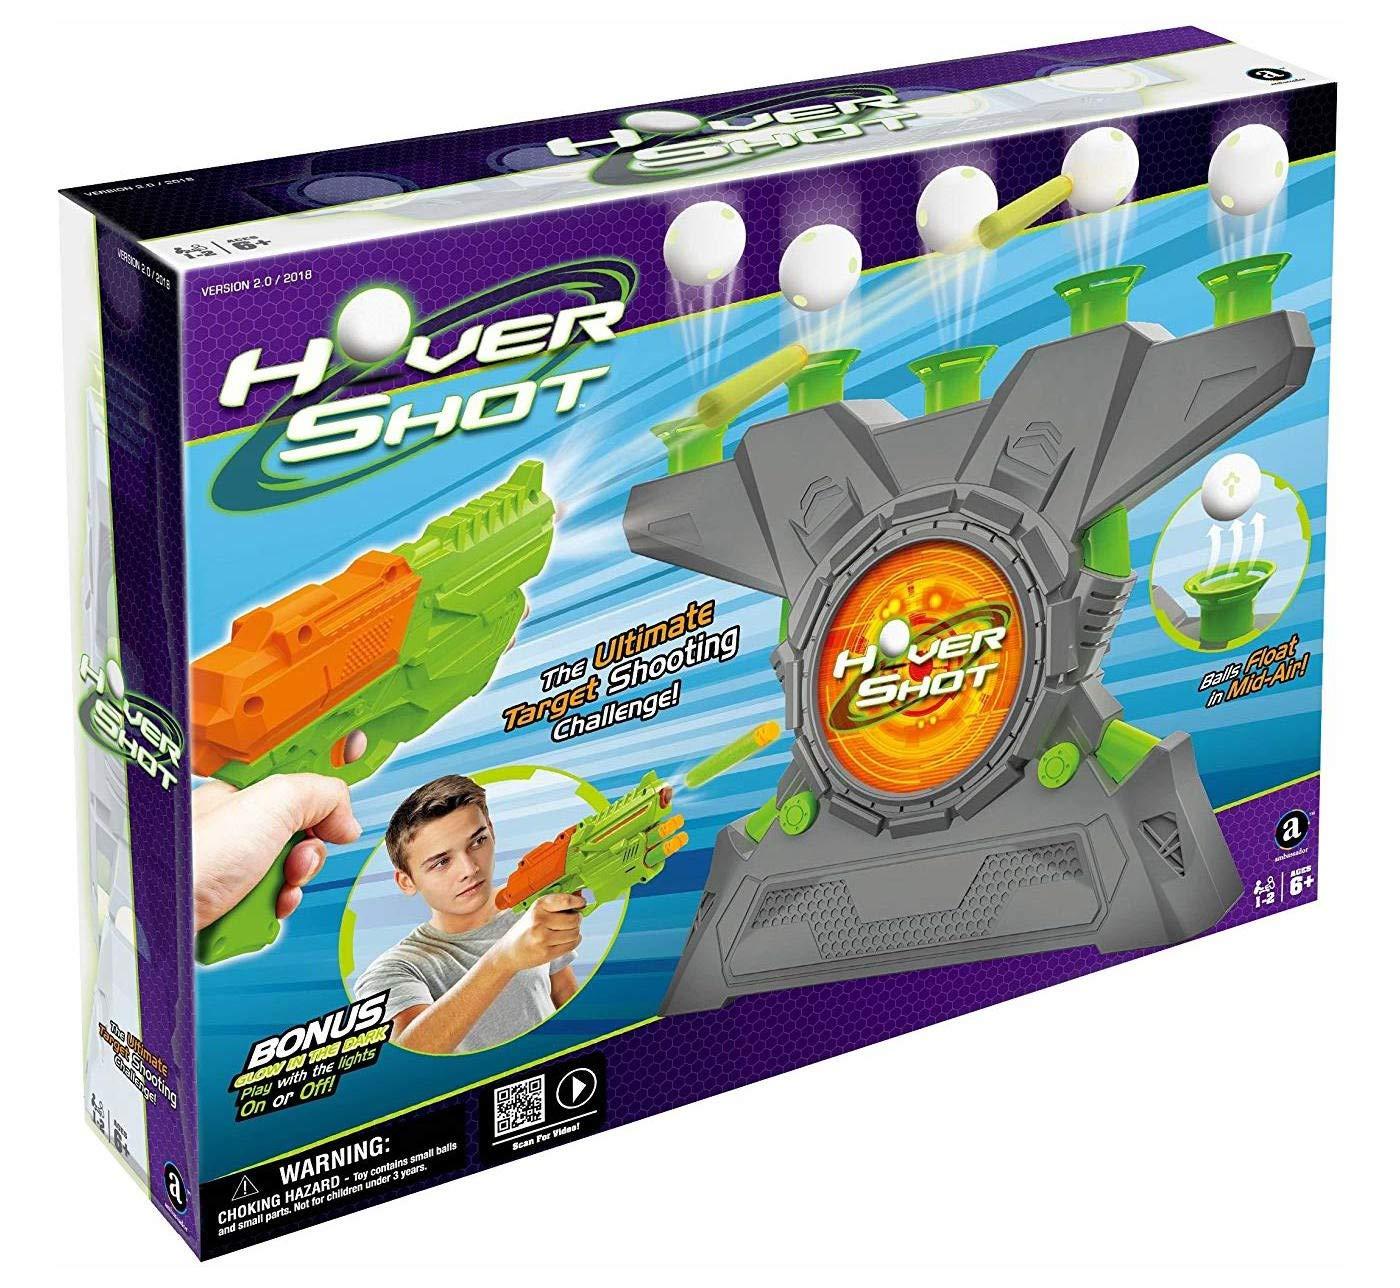 Ambassador Hover Shot Floating Target Game バーショットフローティングターゲットゲーム [並行輸入品] B07HRBZ2L9